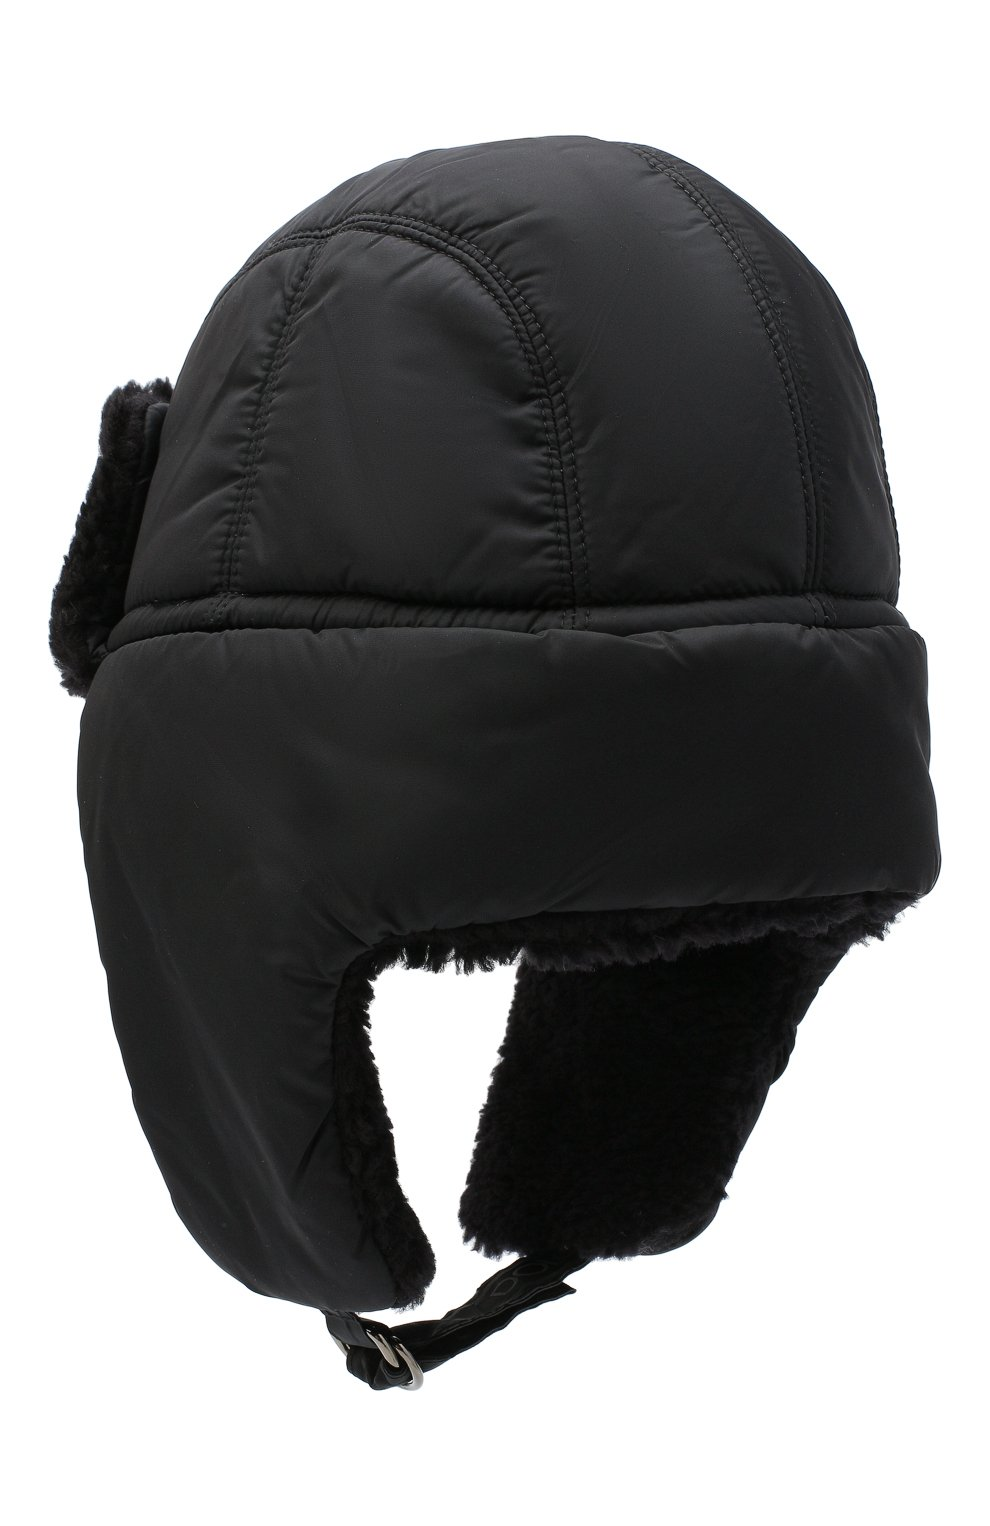 Мужская утепленная шапка-ушанка DOLCE & GABBANA черного цвета, арт. GH574Z/FUMQG | Фото 2